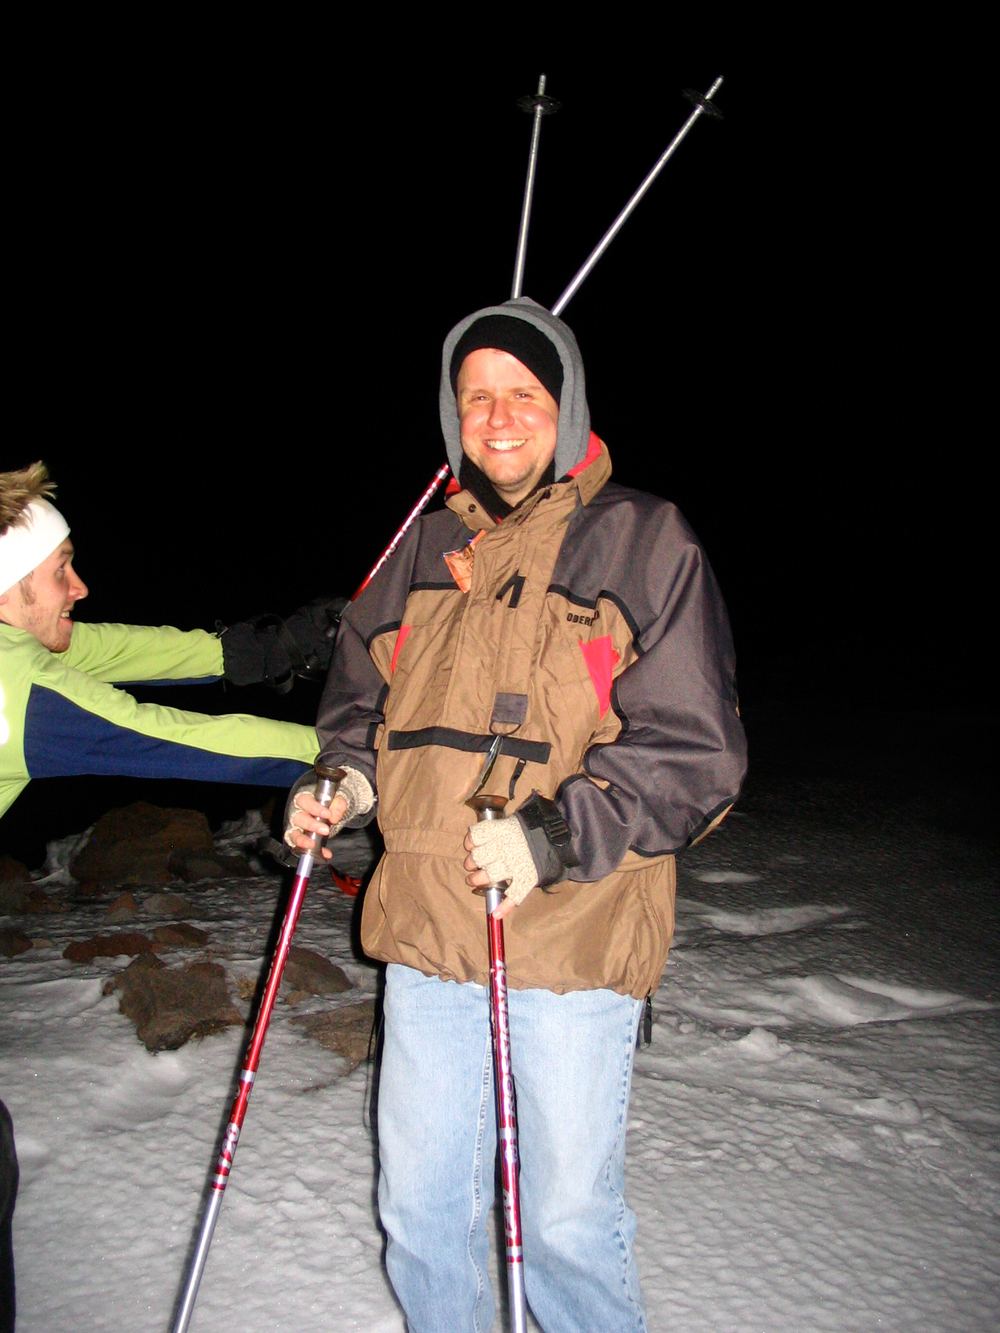 20061219-winter 2006 054.jpg